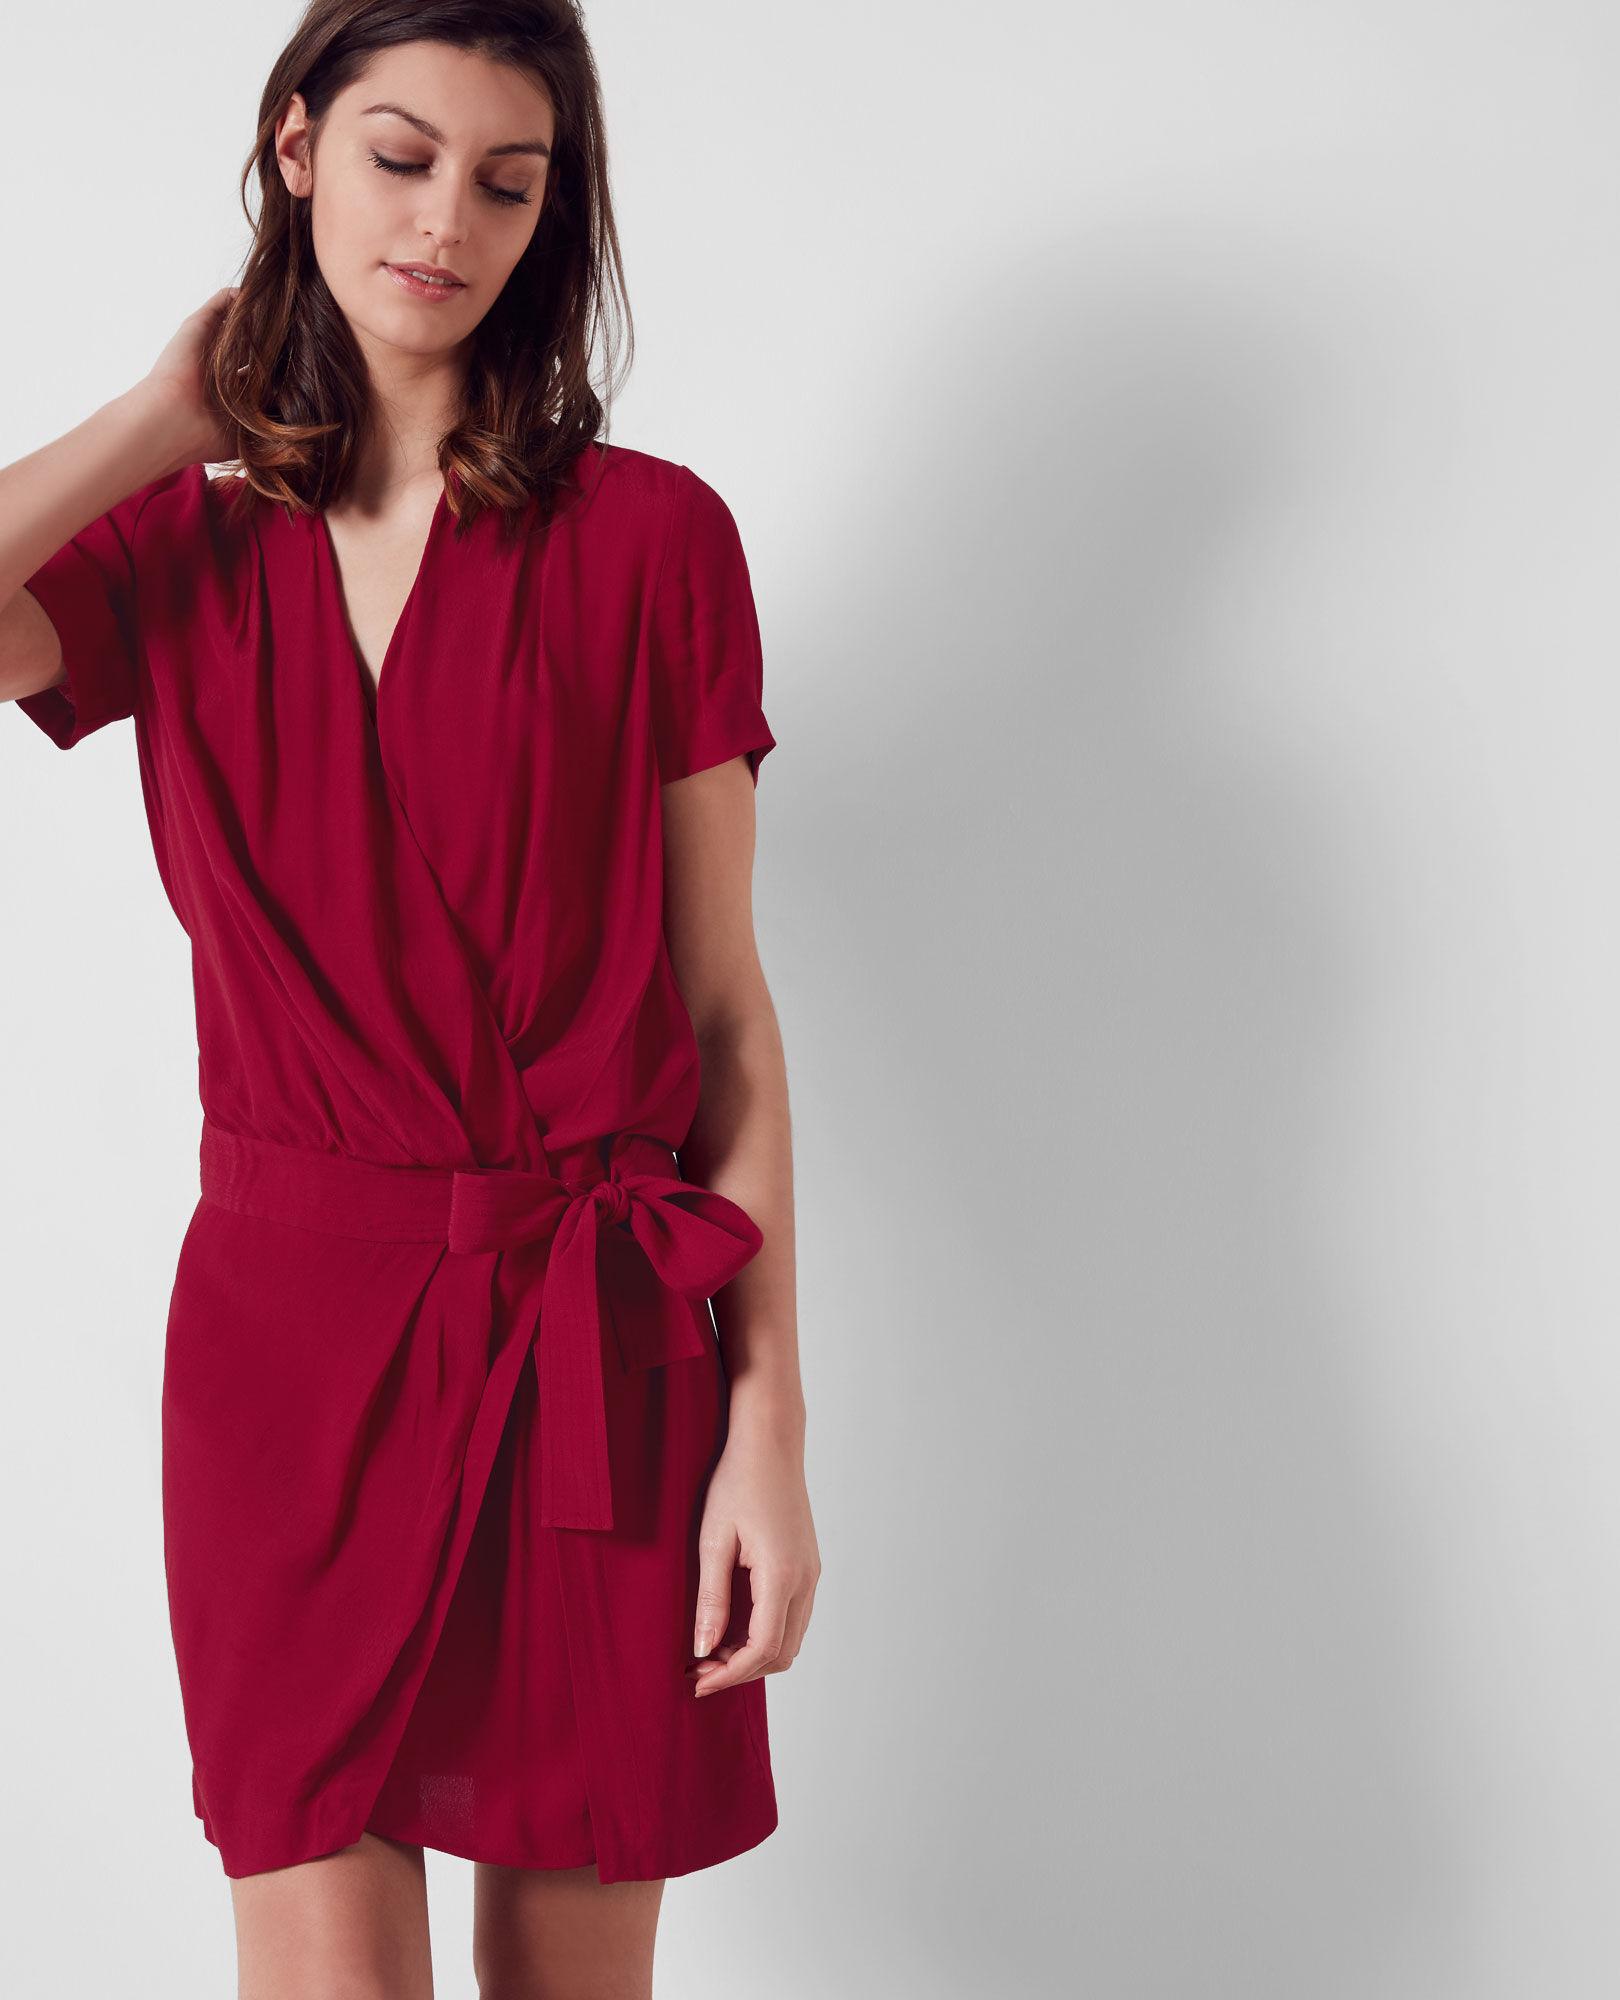 Robe porte-feuille Crimson Cifeel